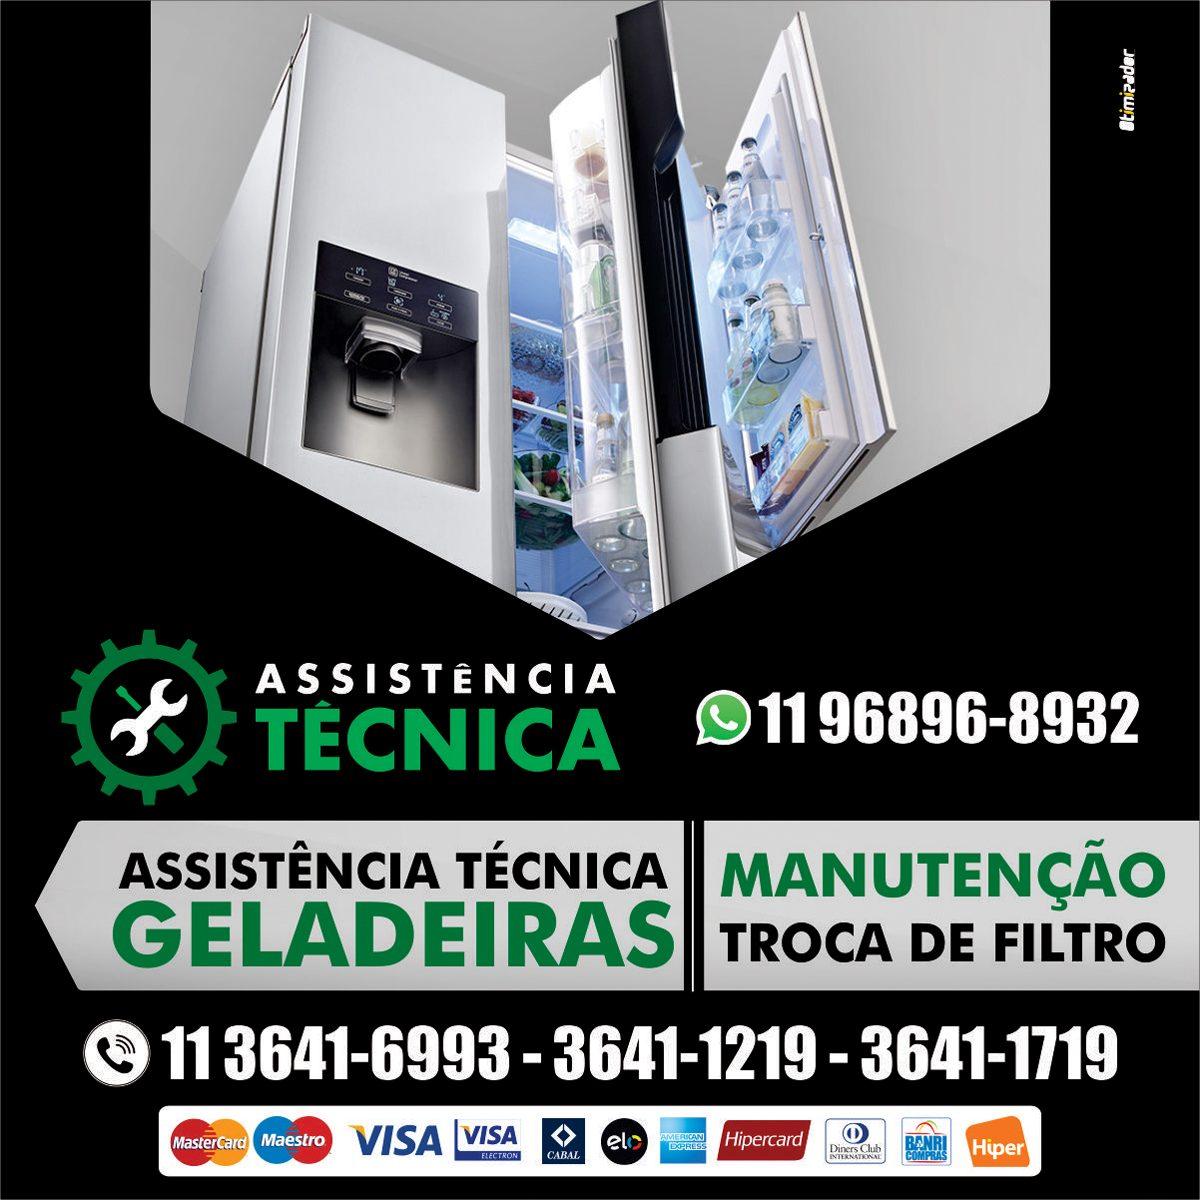 anuncio-credenciada-GELADEIRA